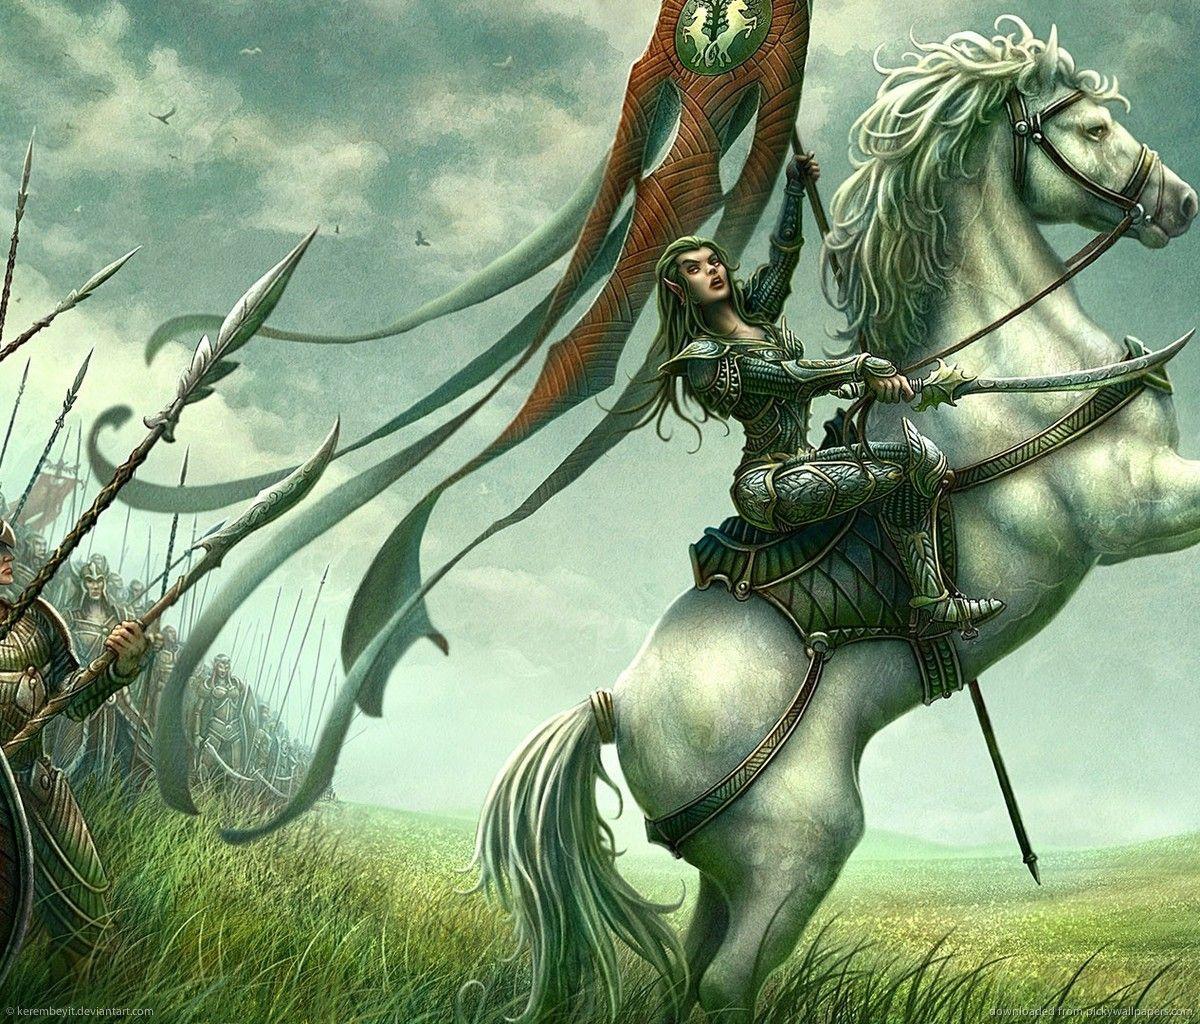 Best Wallpaper Horse Samsung Galaxy - 8ccb6f2cc13eb4ad81221318ec43e5d2  Pic_89374.jpg